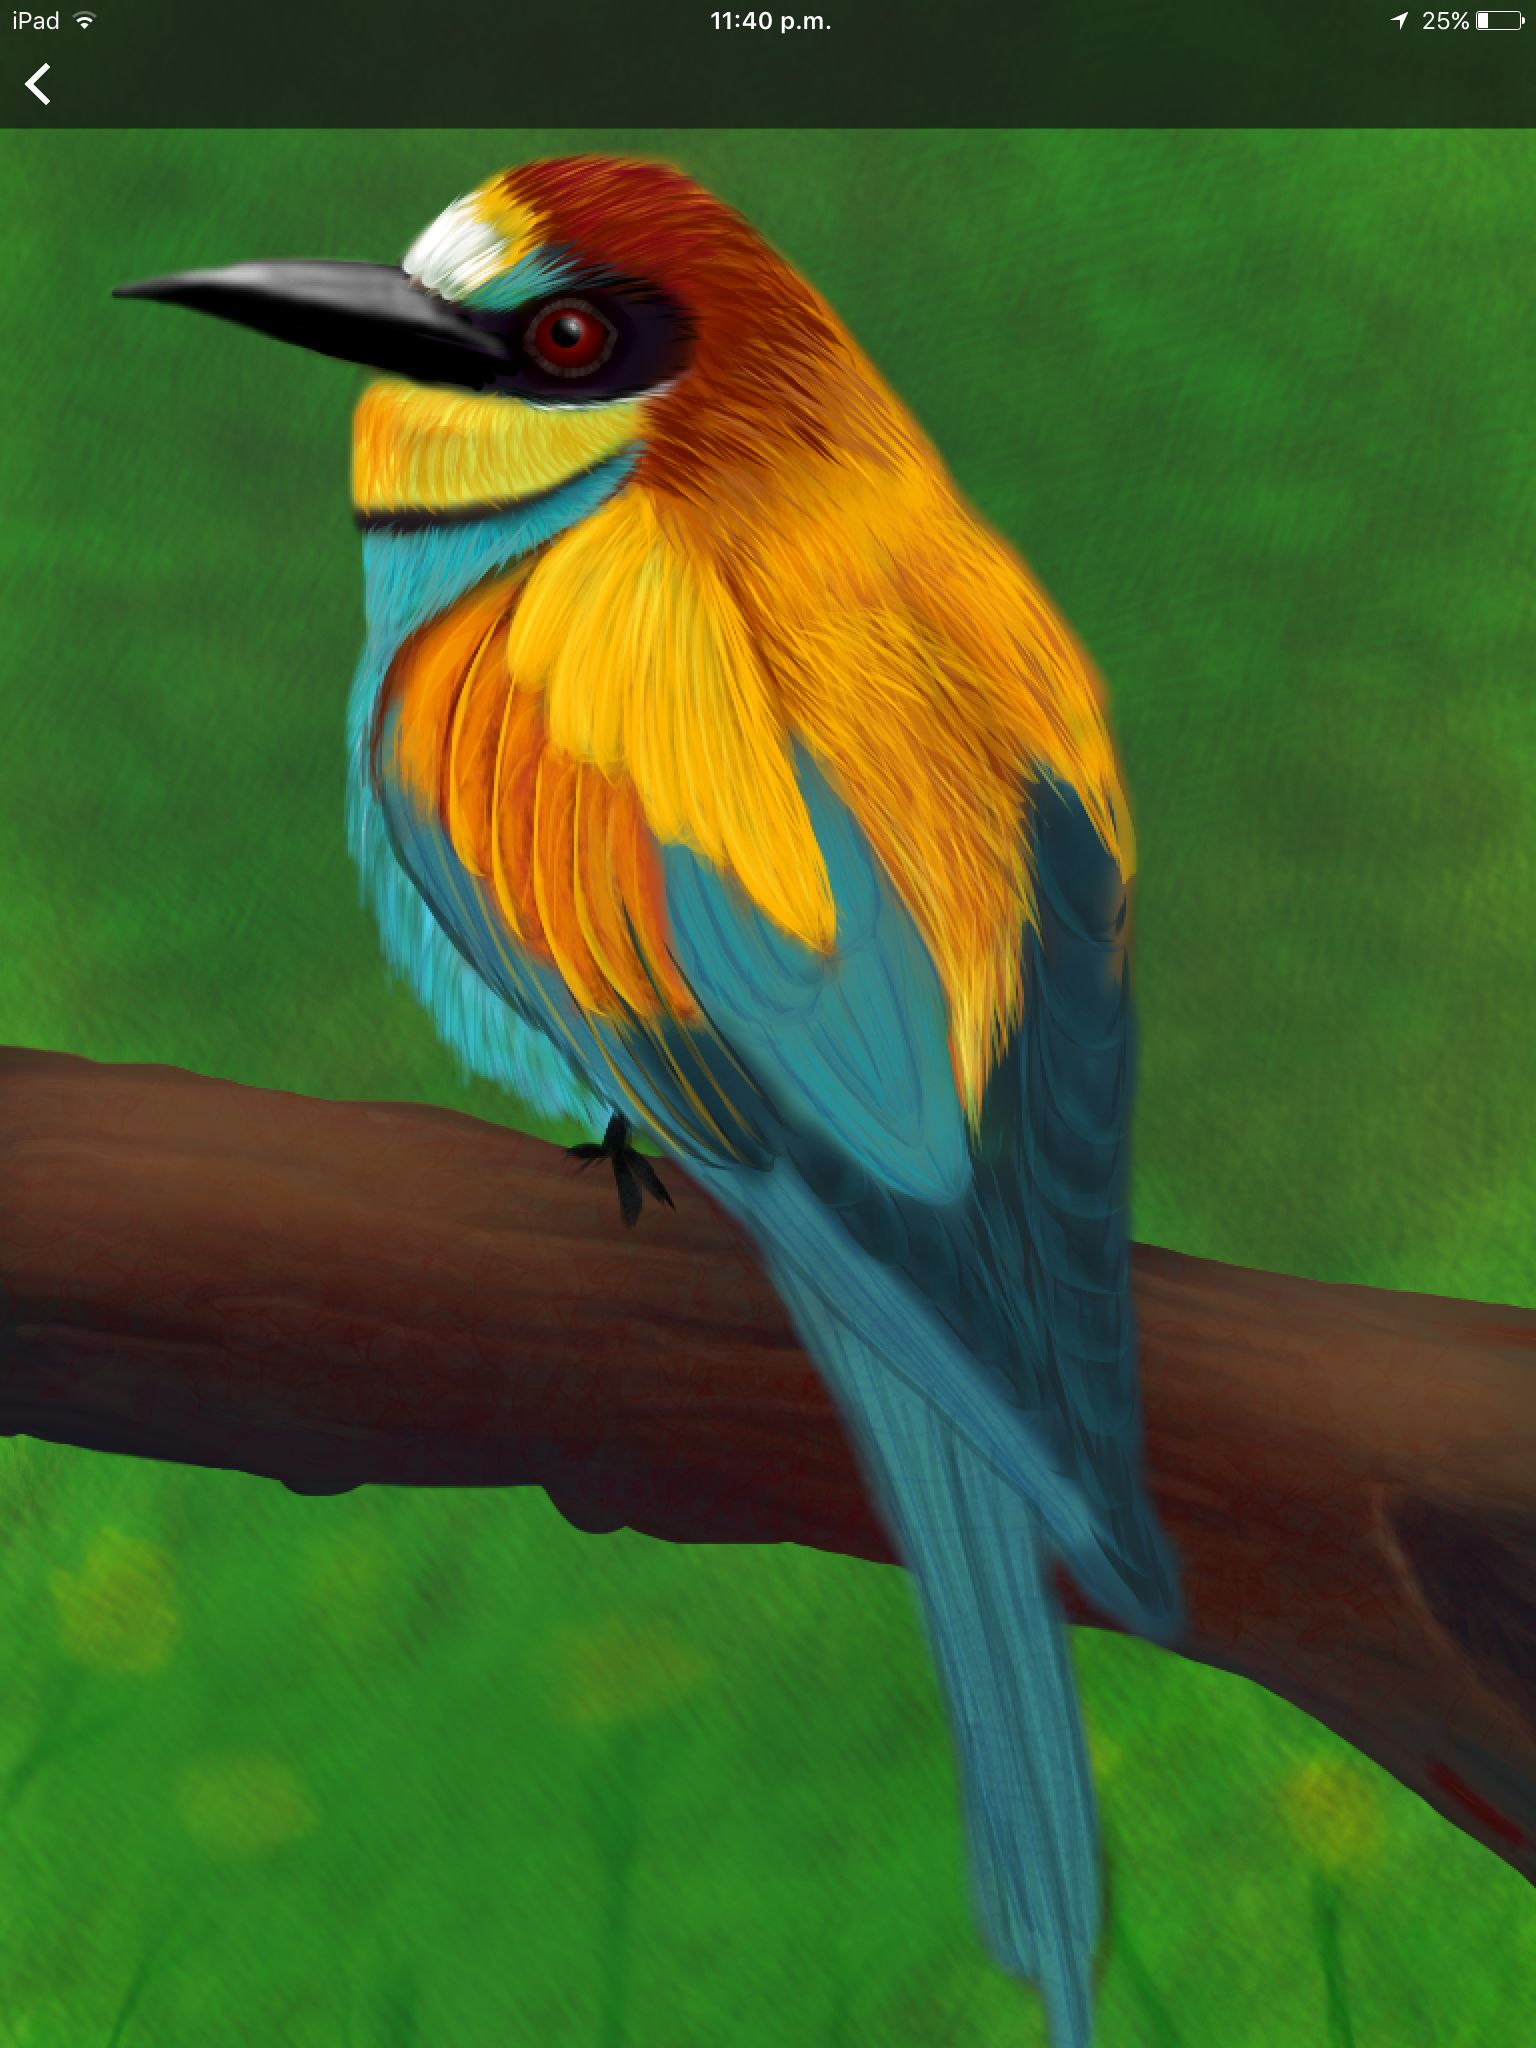 Beecatcher Wild animals photography, Colorful birds